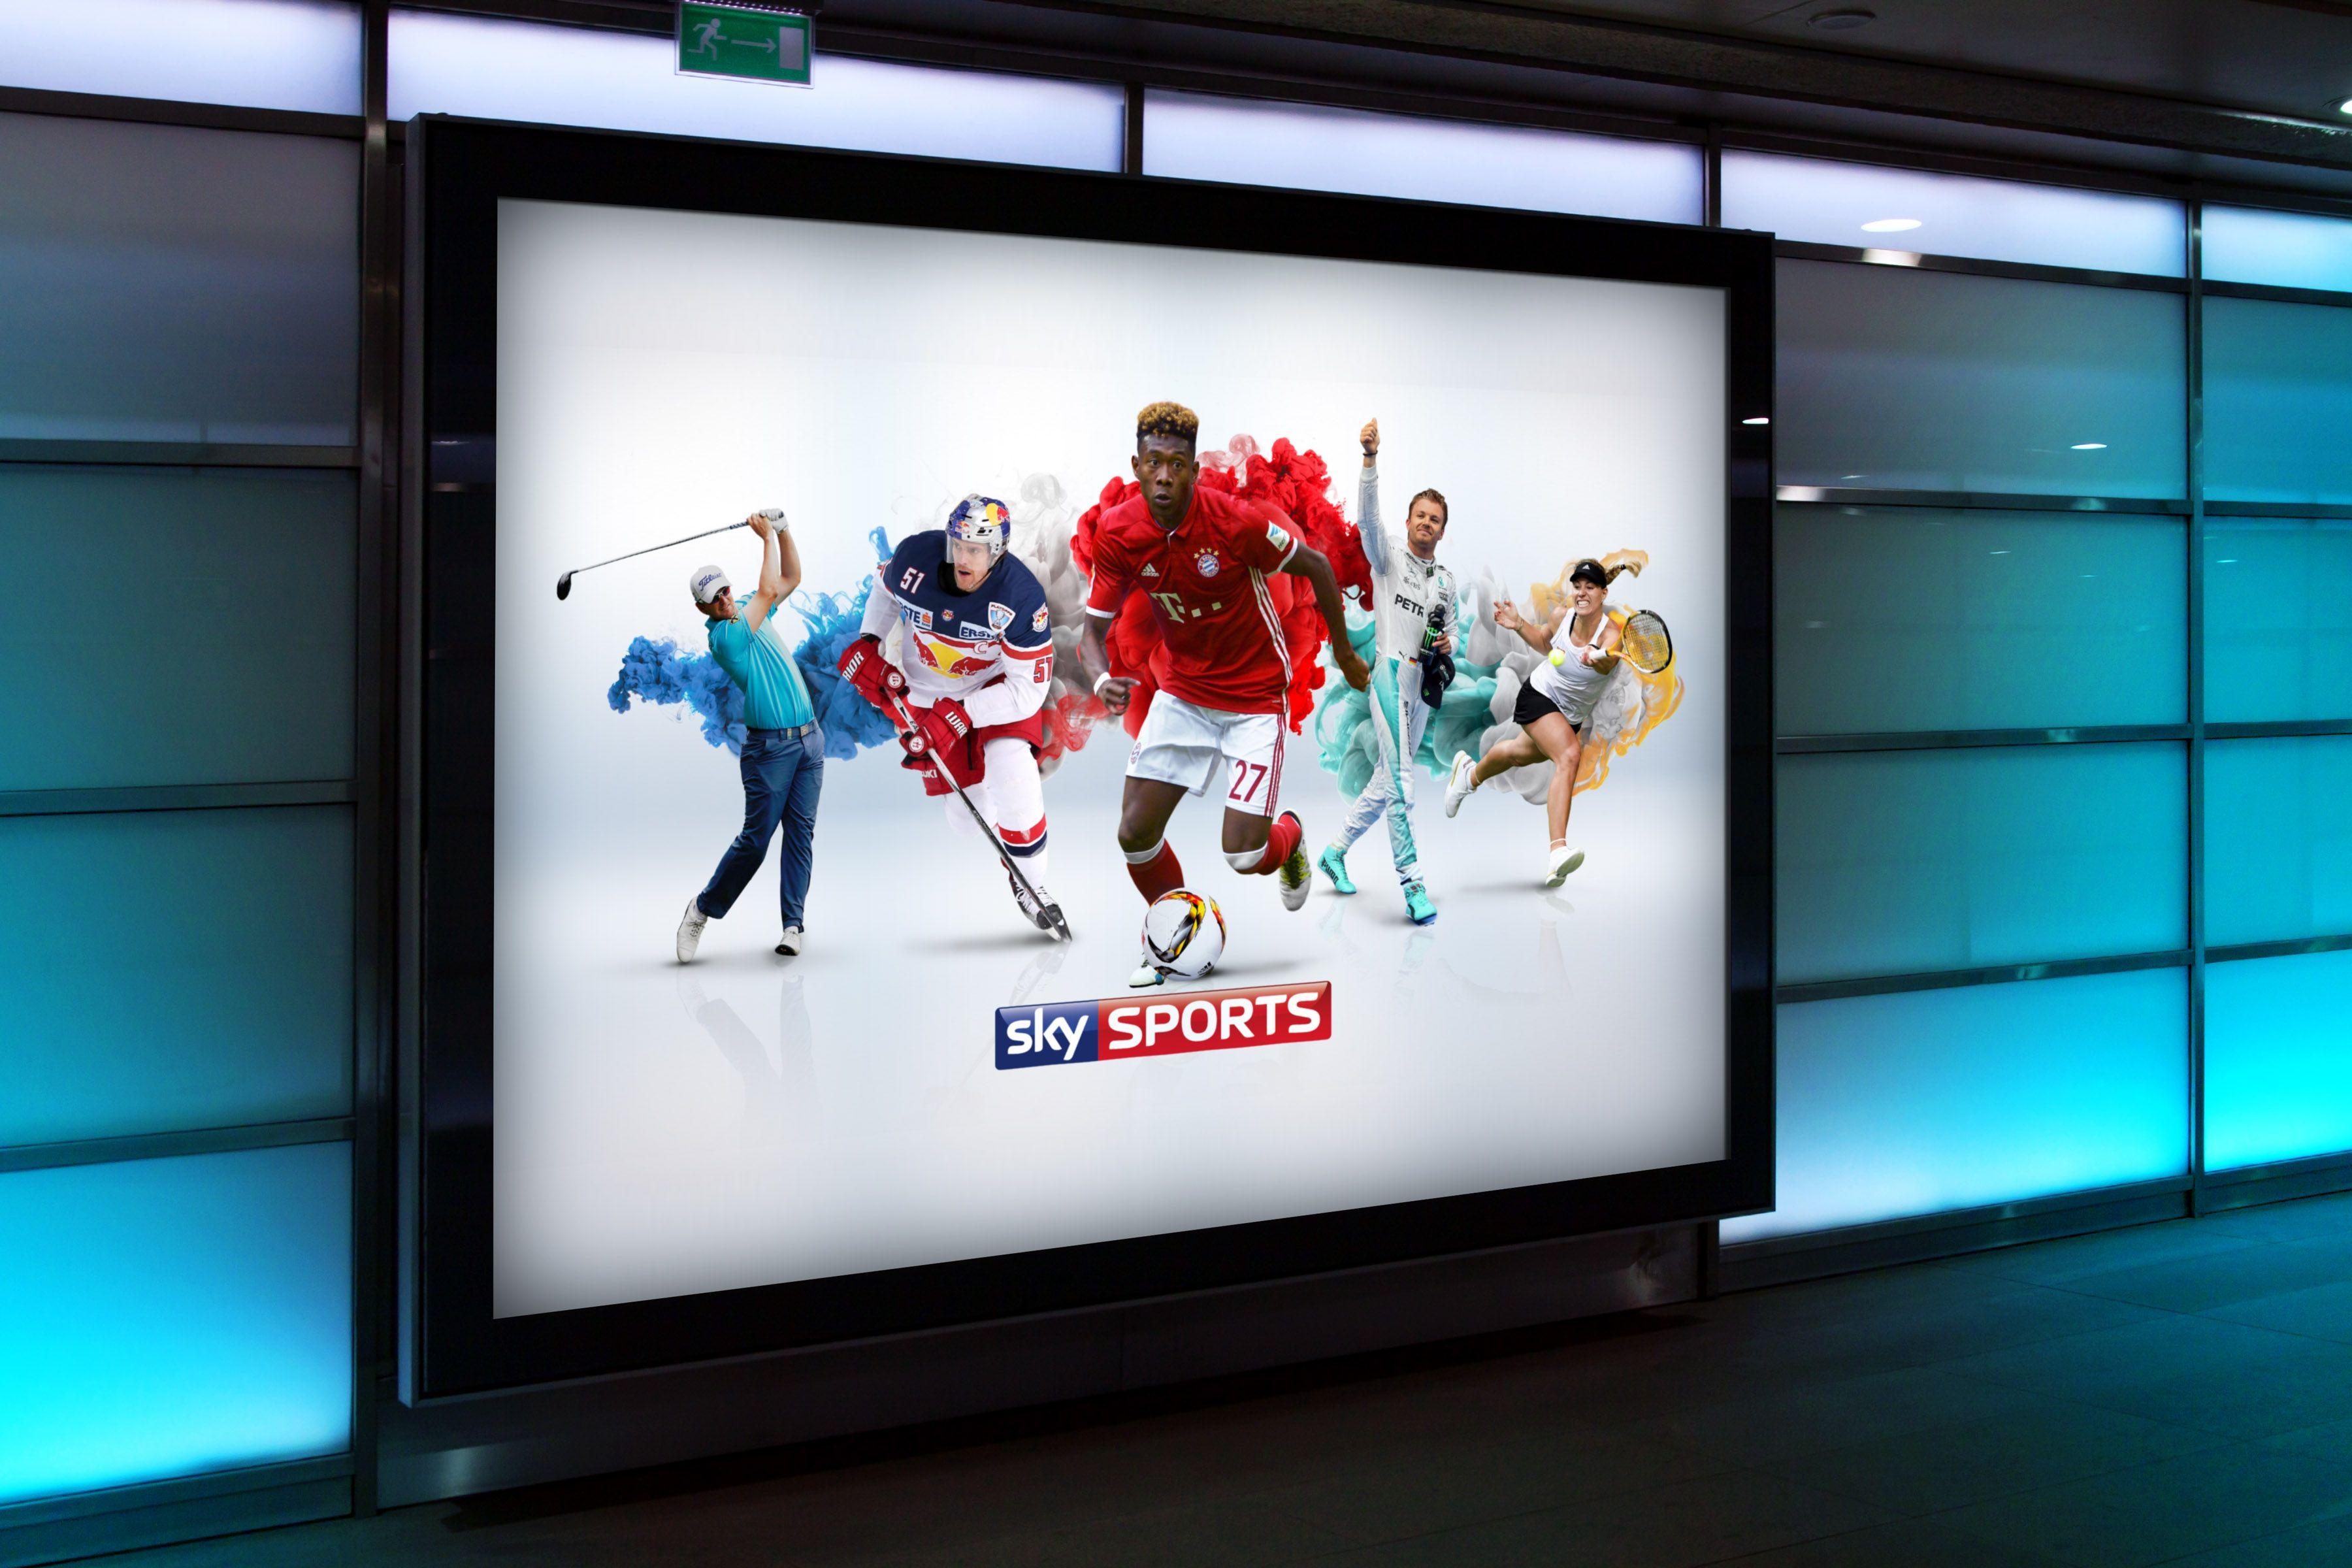 Sky Sports Advertising Billboard